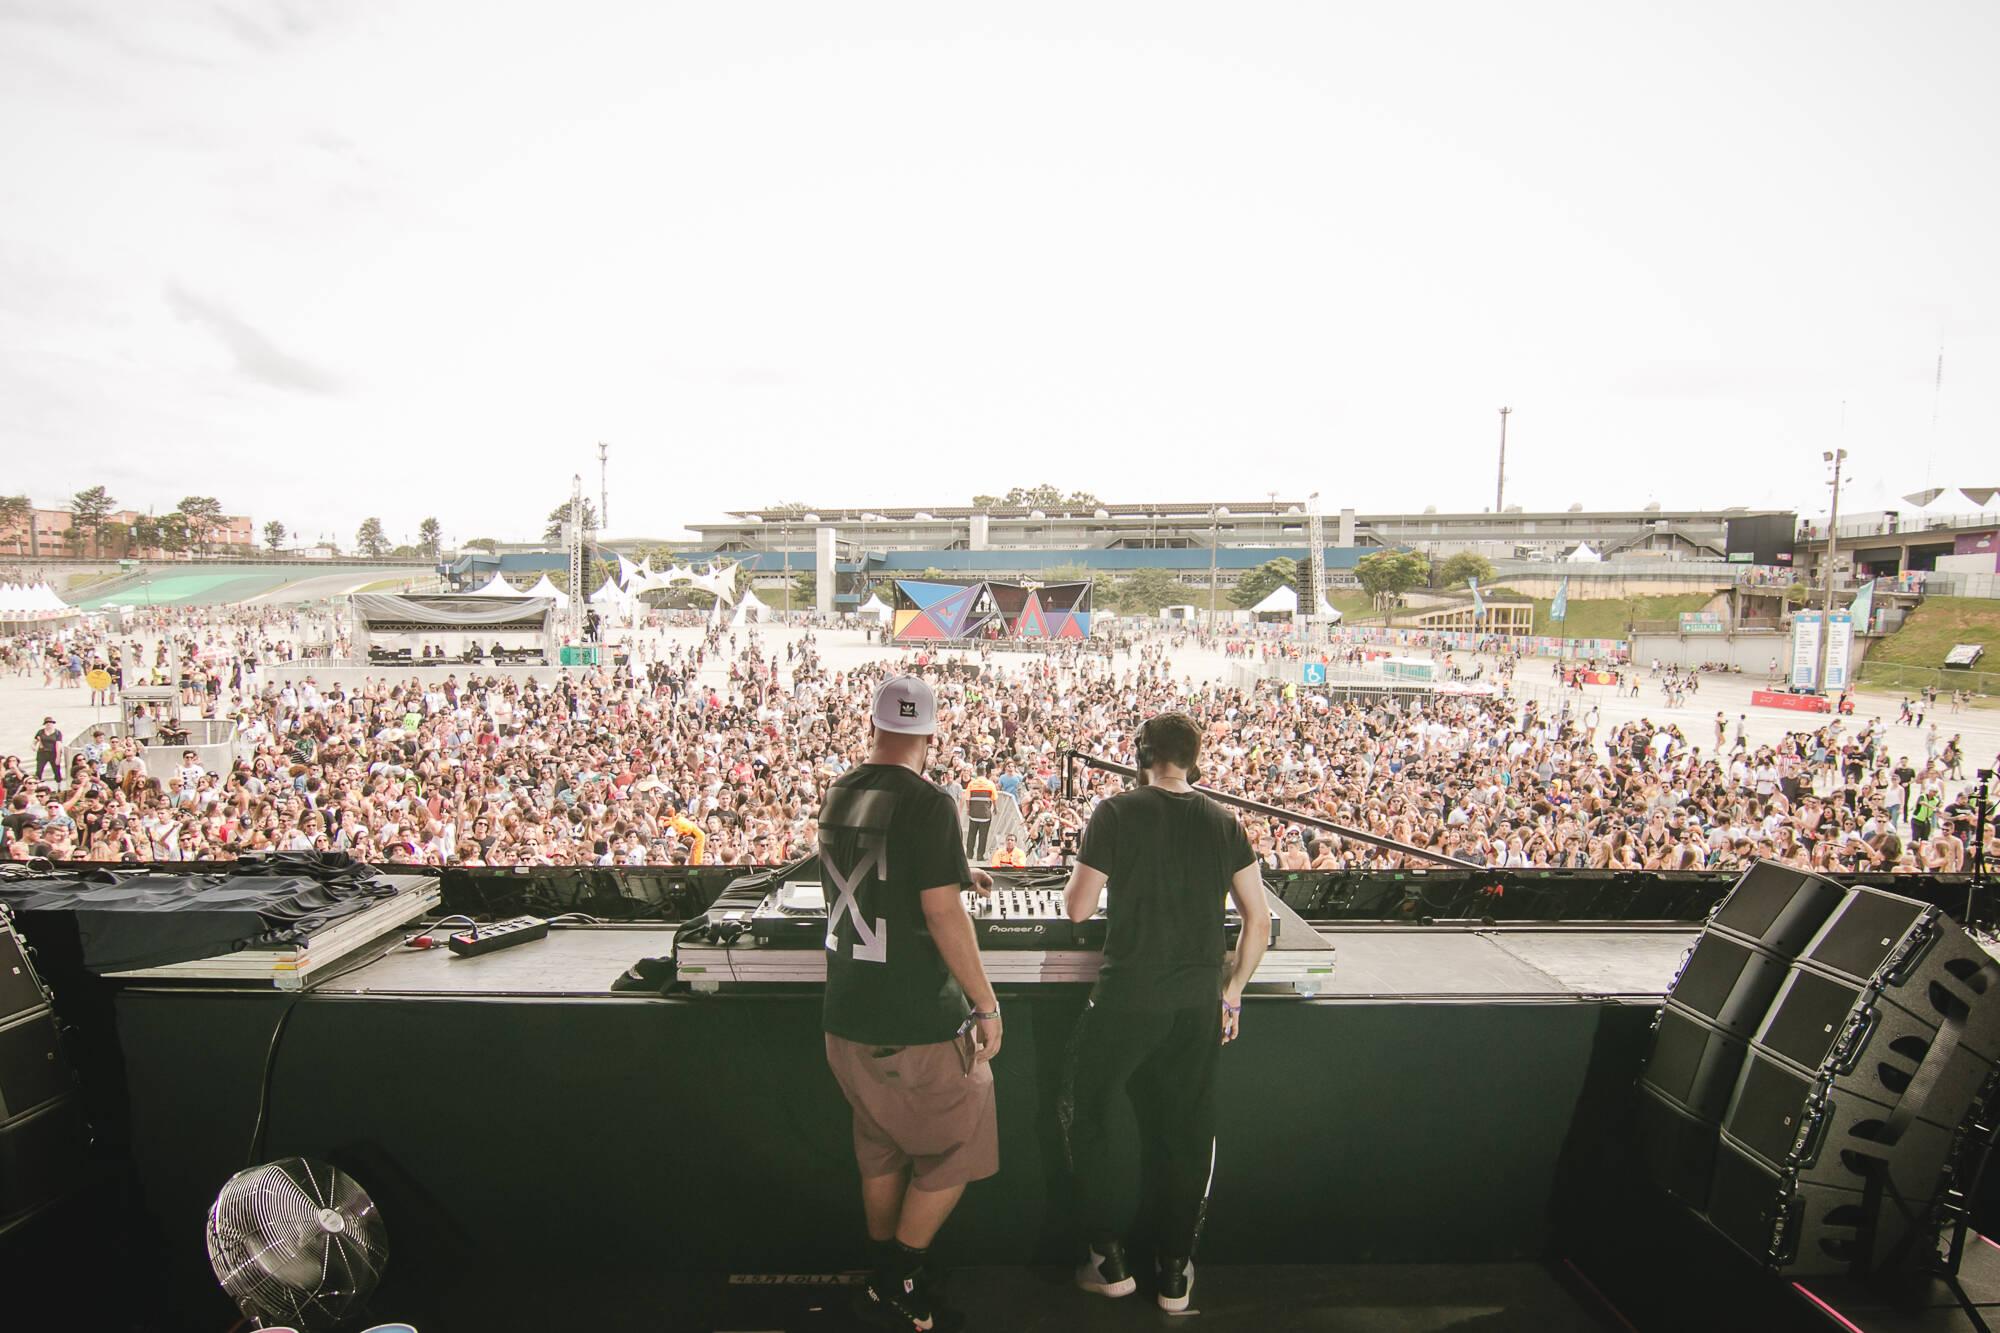 Lollapalooza 2019 - Dashdot. Foto: Divulgação/Lollapalooza